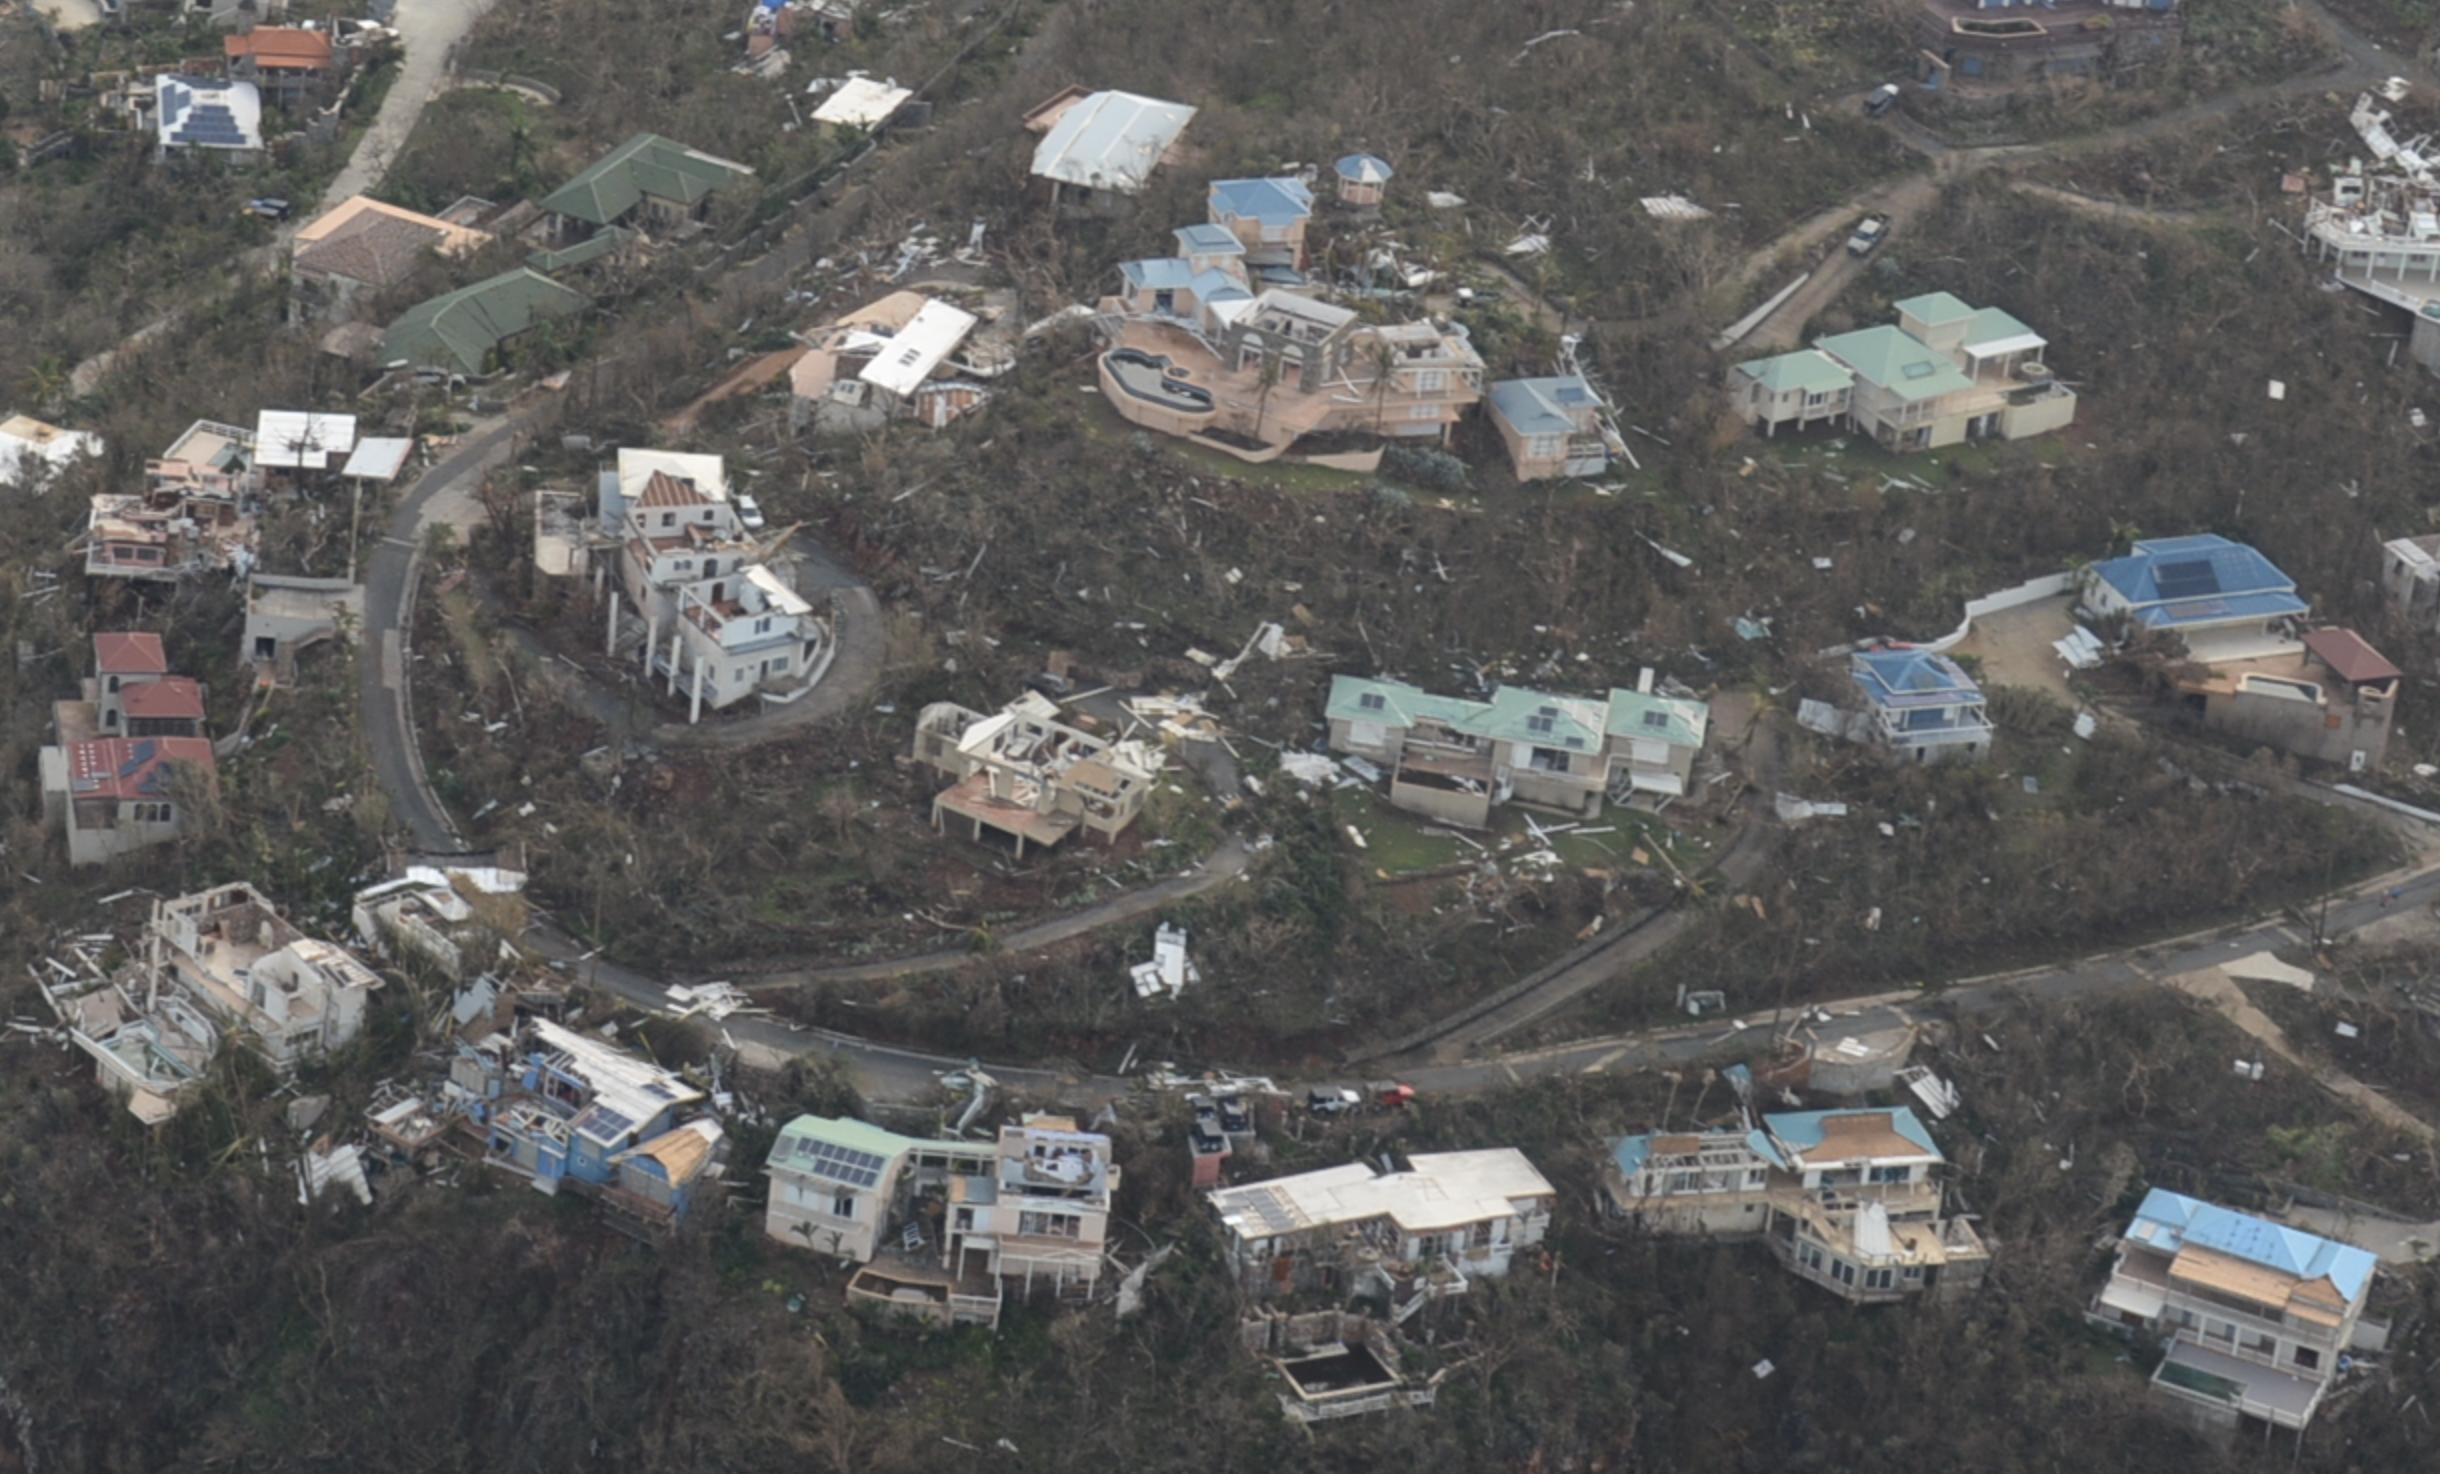 Pin On Hurricanes Irma And Maria